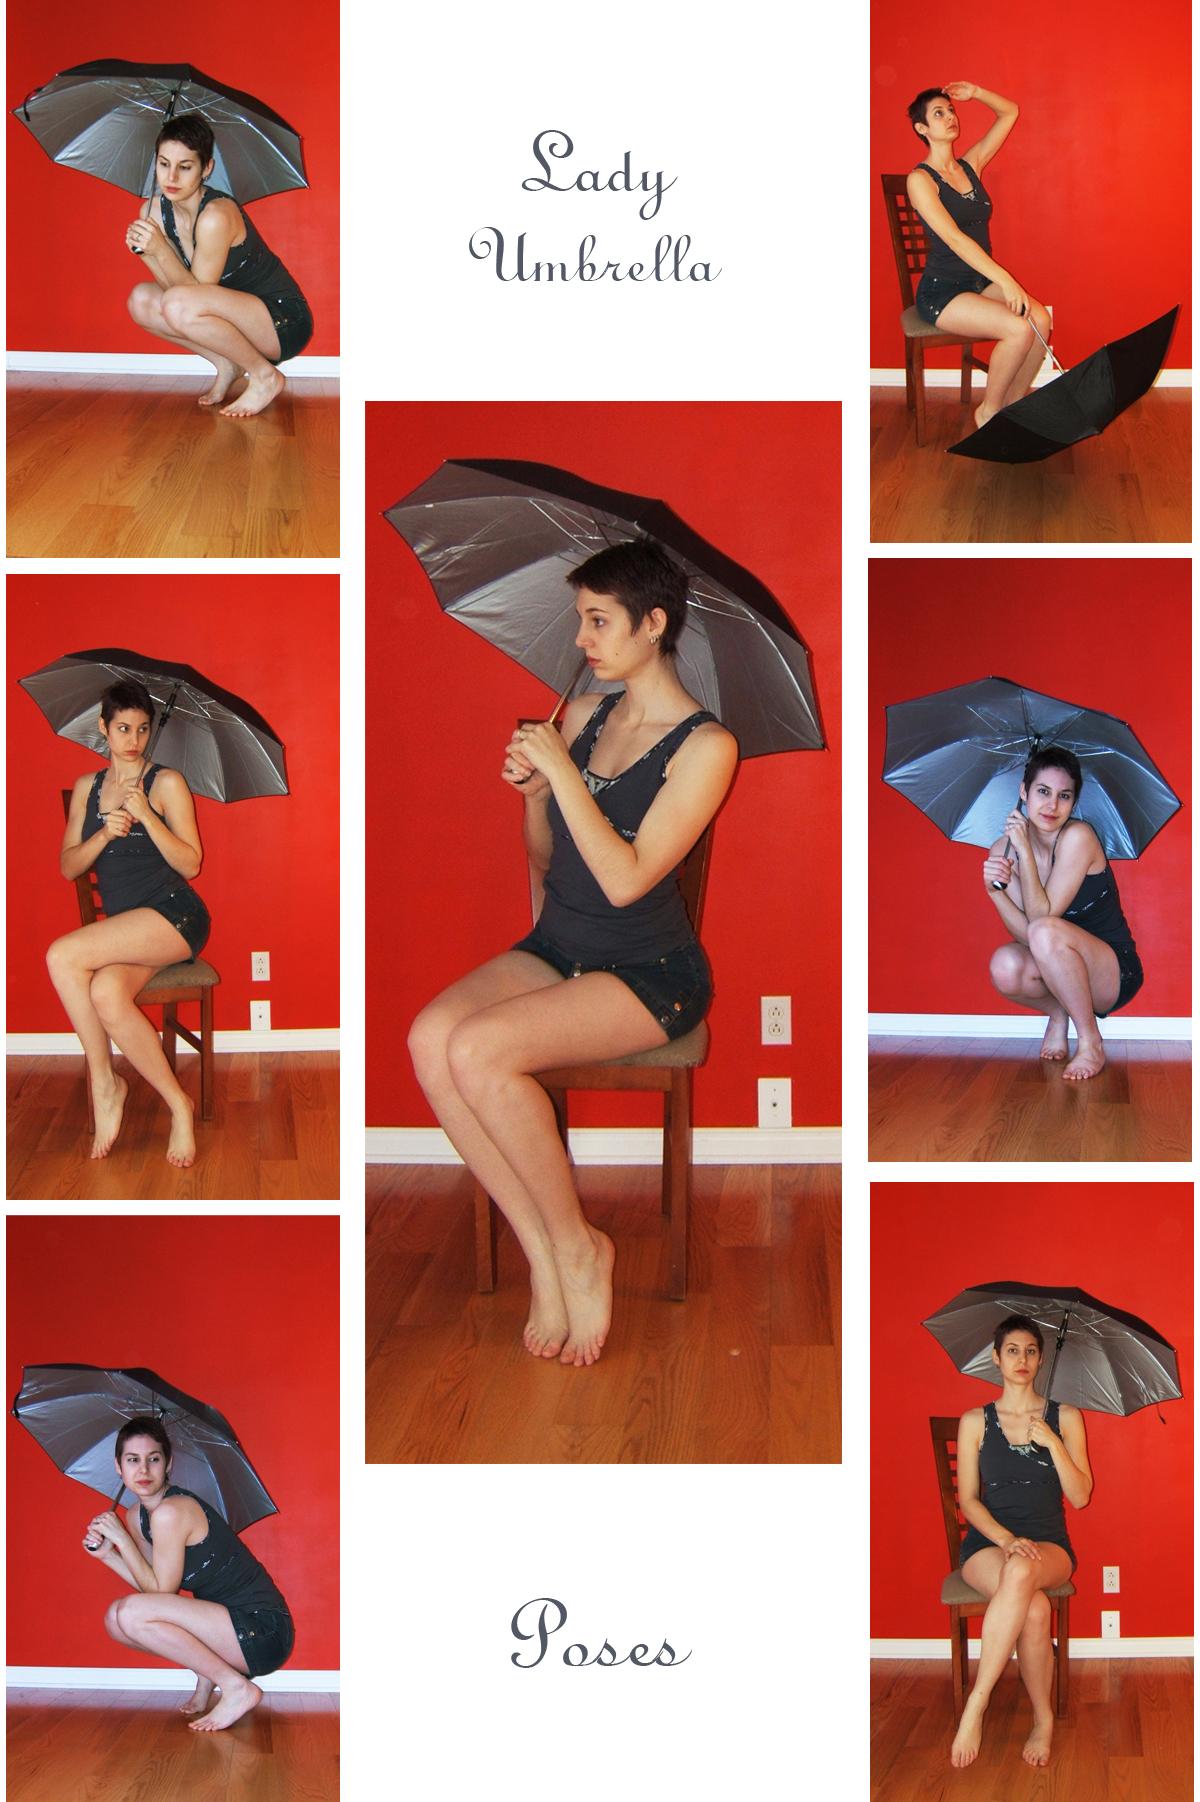 STOCK - Lady Umbrella by LaLunatique